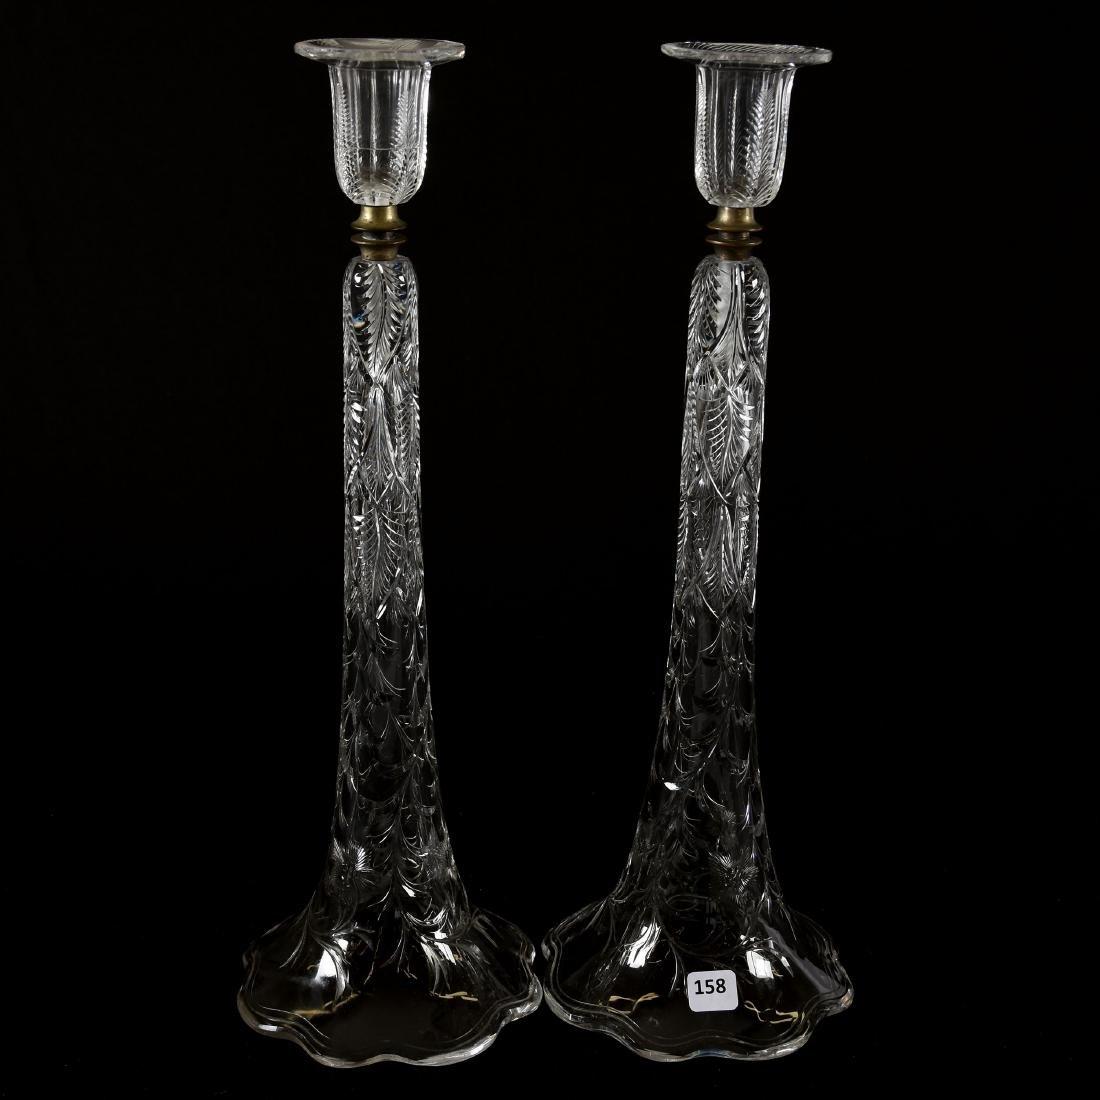 Pair Candlesticks, Engraved Fern, Vine & Floral